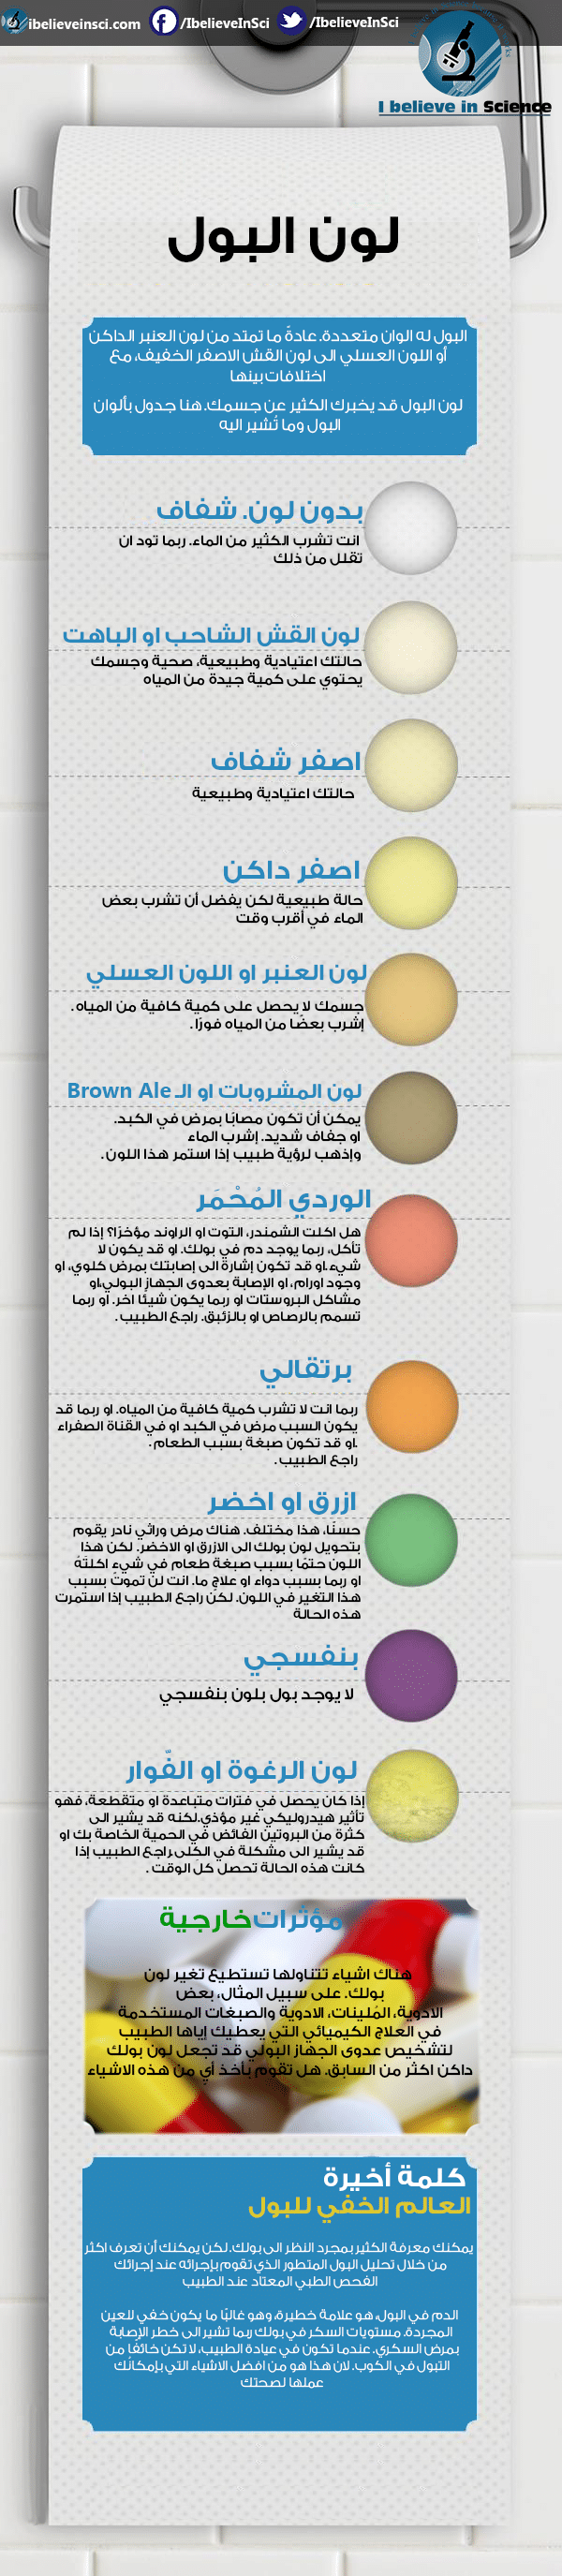 لون البول و دلائله Health Fitness Nutrition Health Advice Health Signs